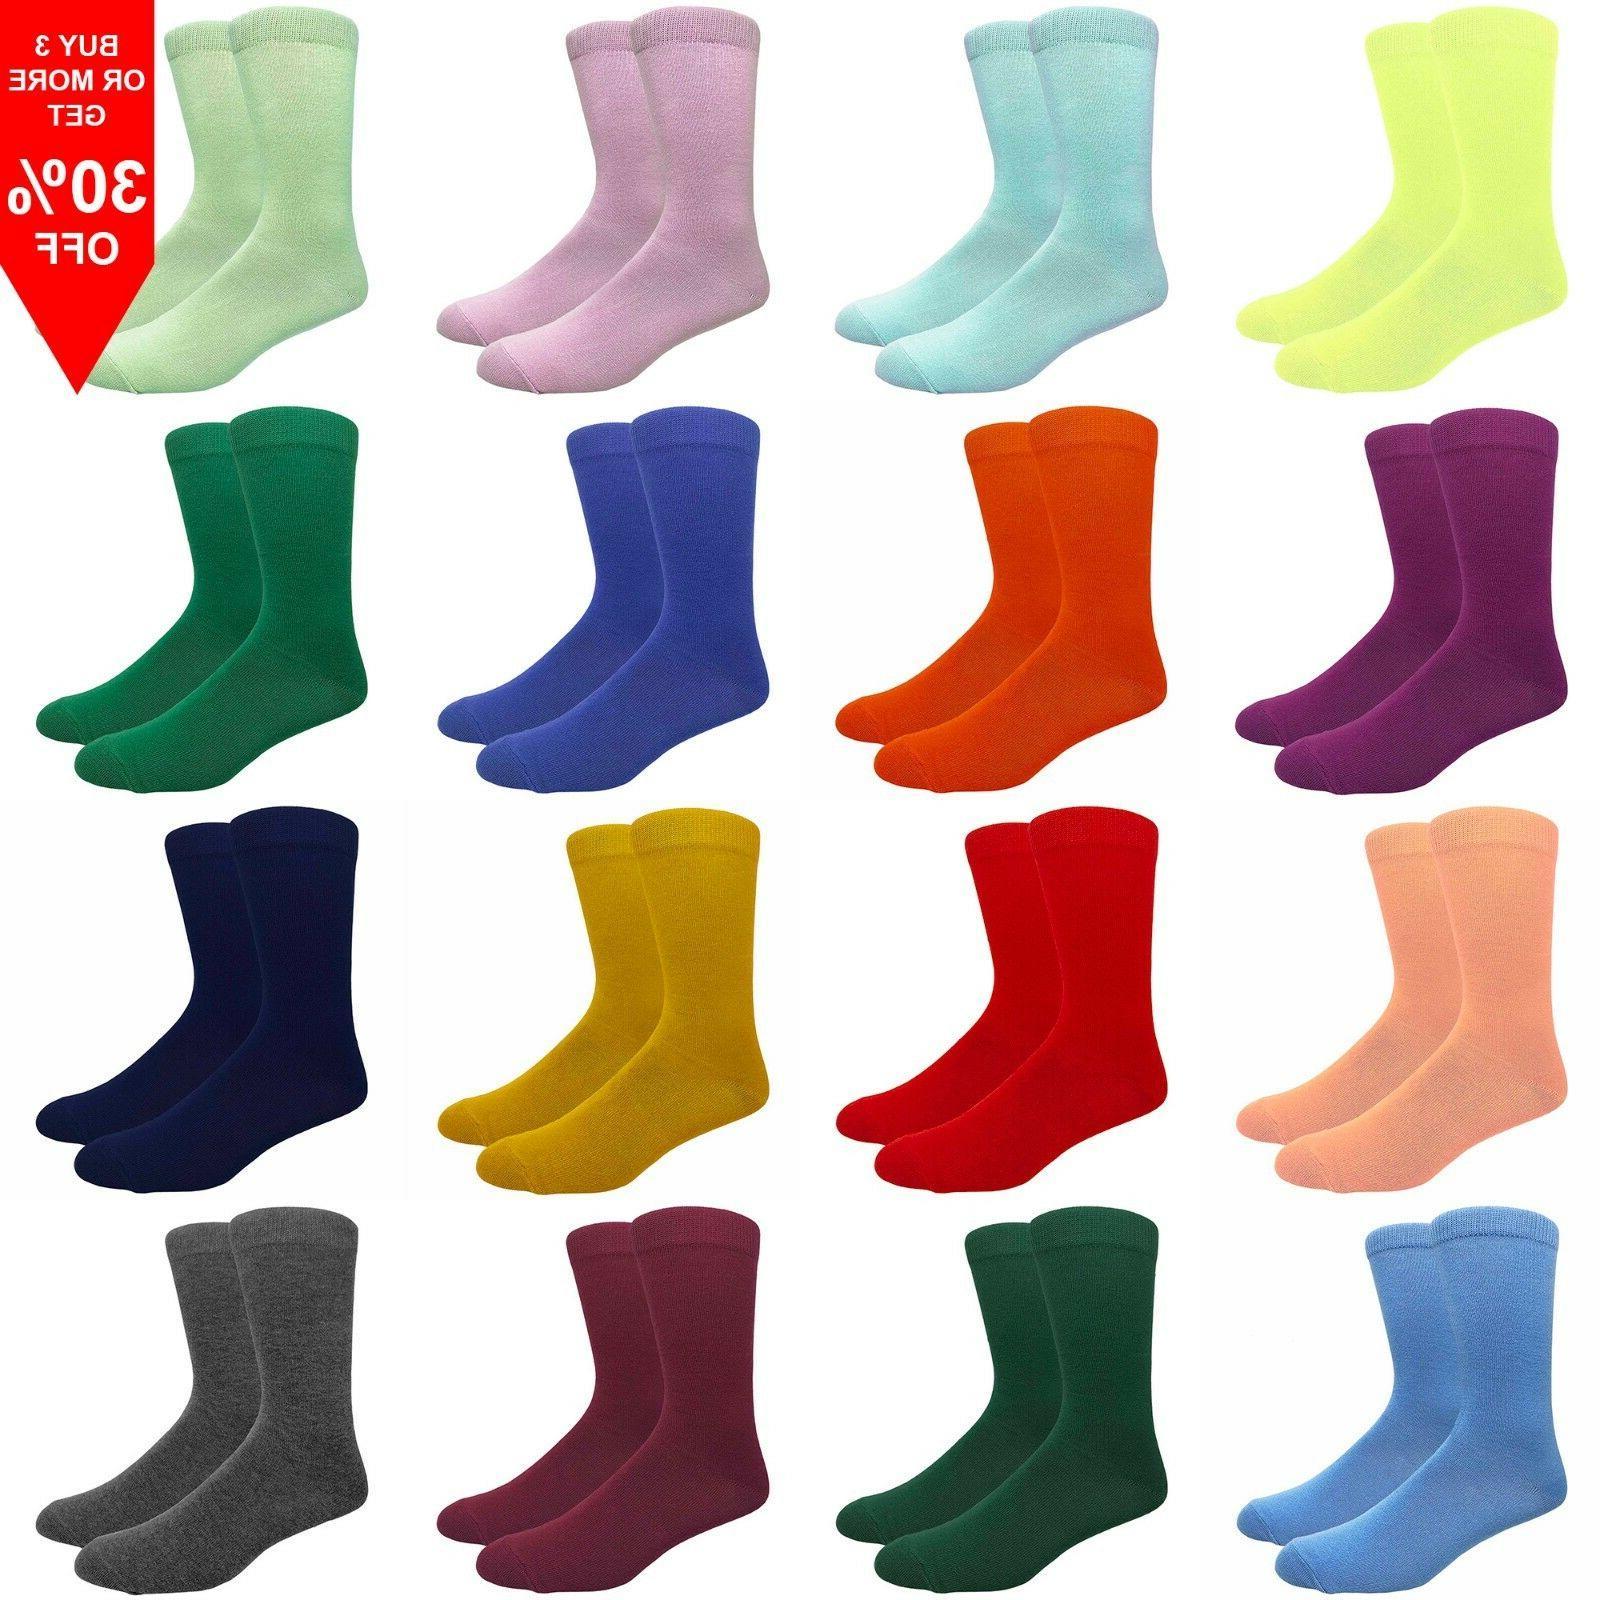 men s solid color cotton dress socks